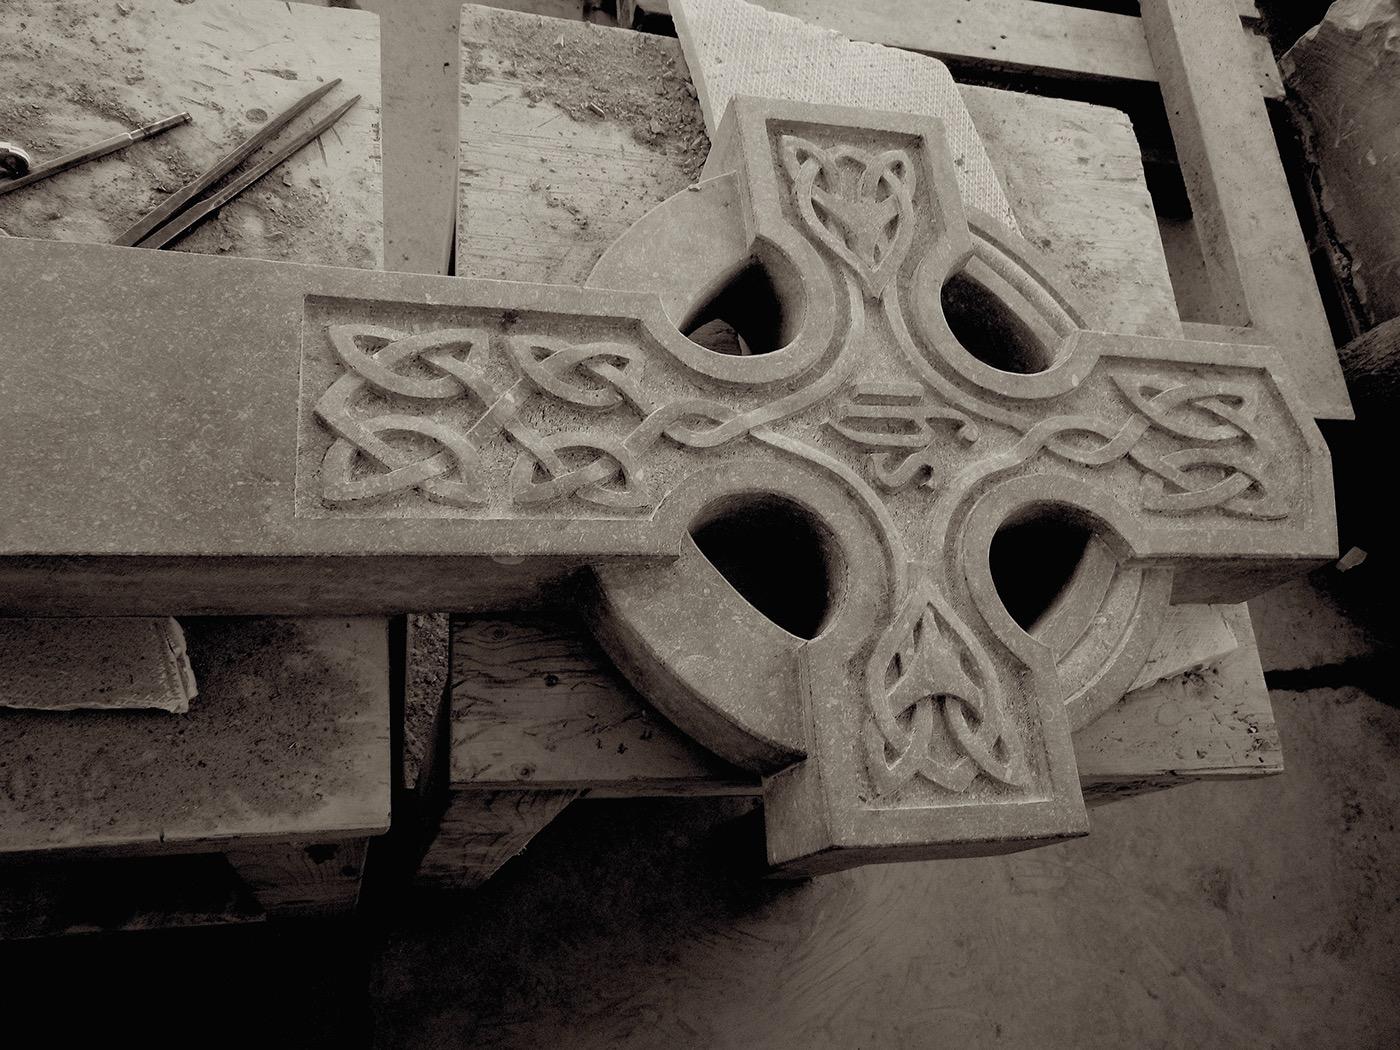 Grafwerk funeral art funerale kunst celtic cross Keltisch kruis irish cross Iers Kruis